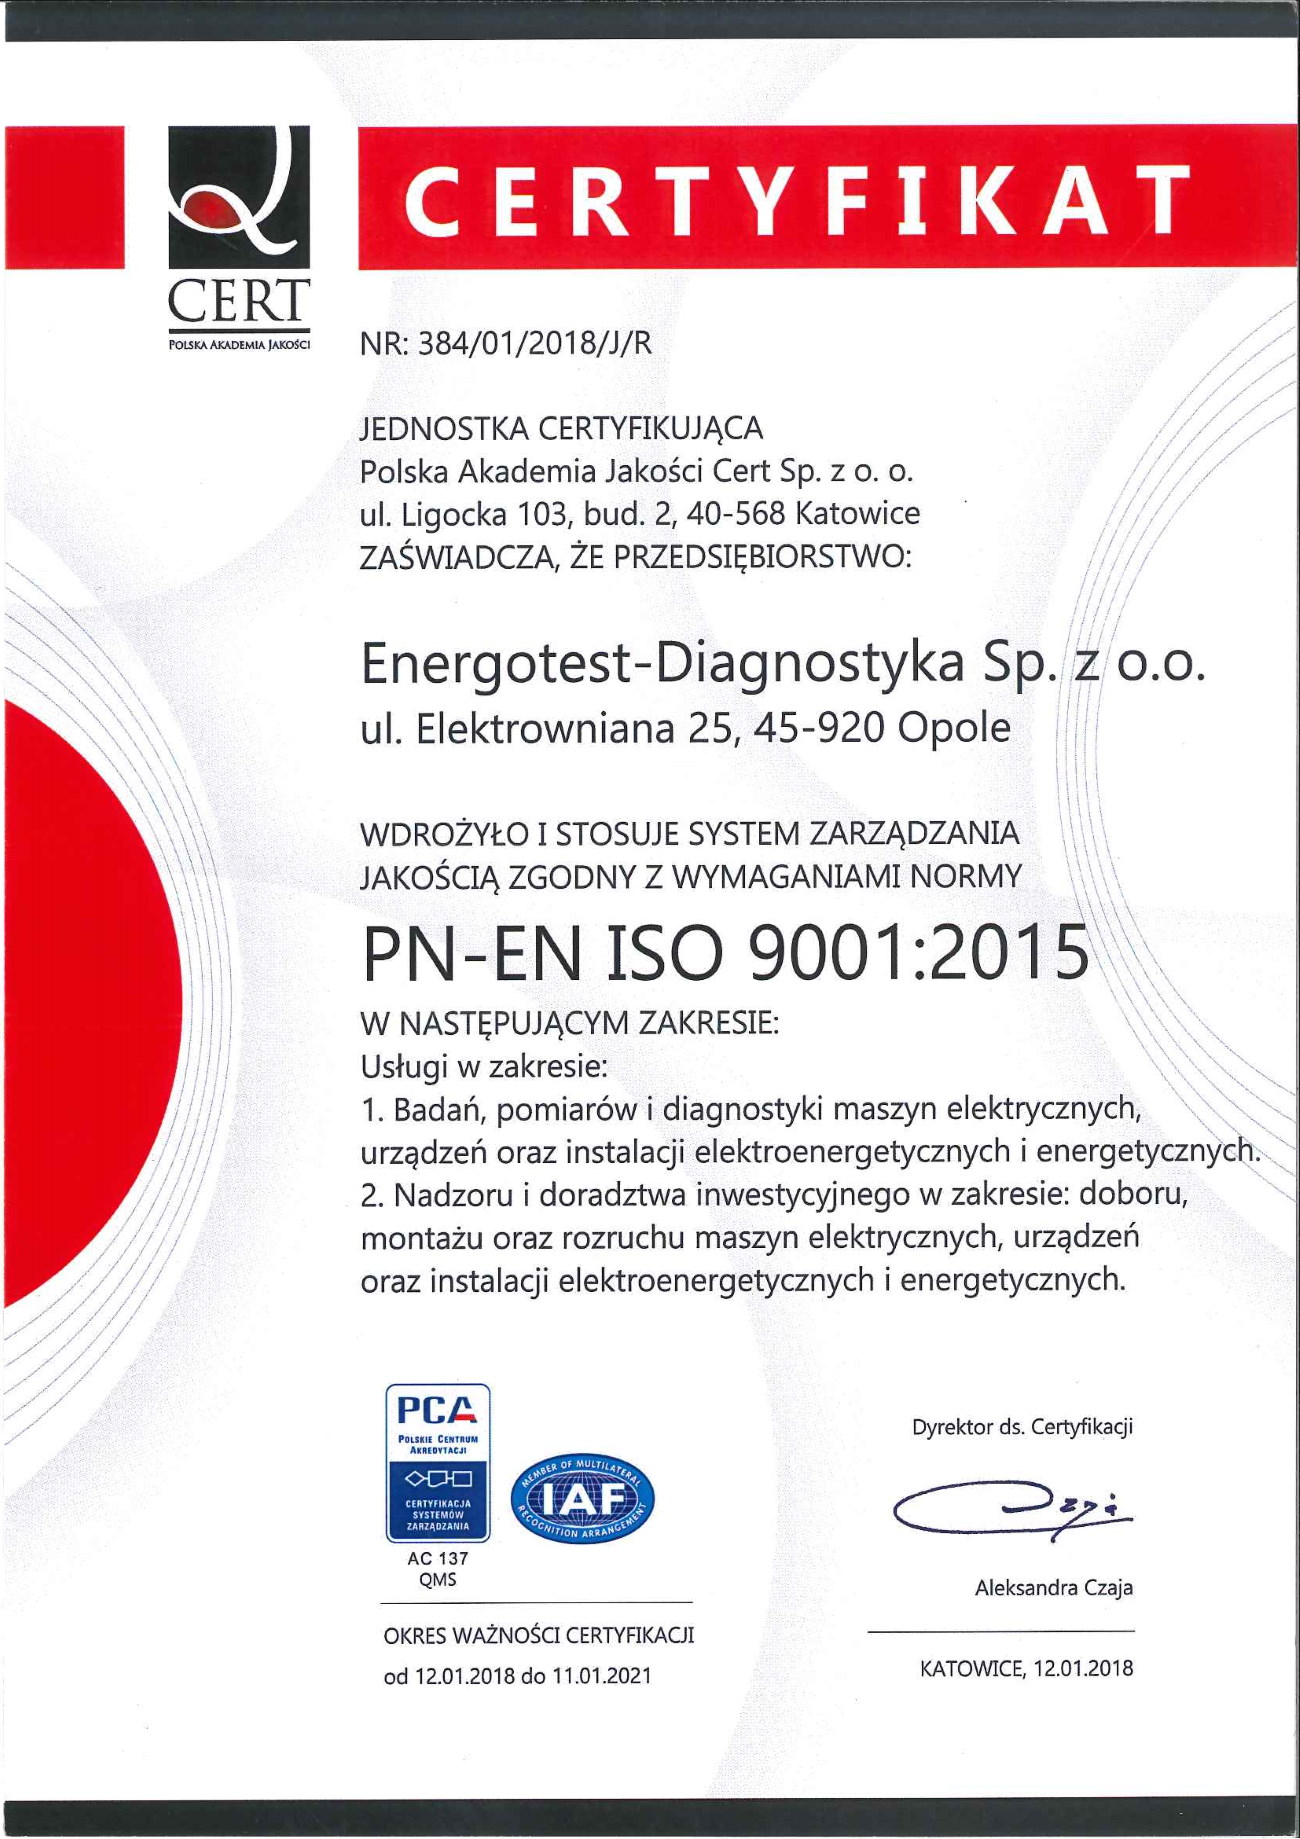 Certyfikat PN-EN ISO 9001:2015 Polish